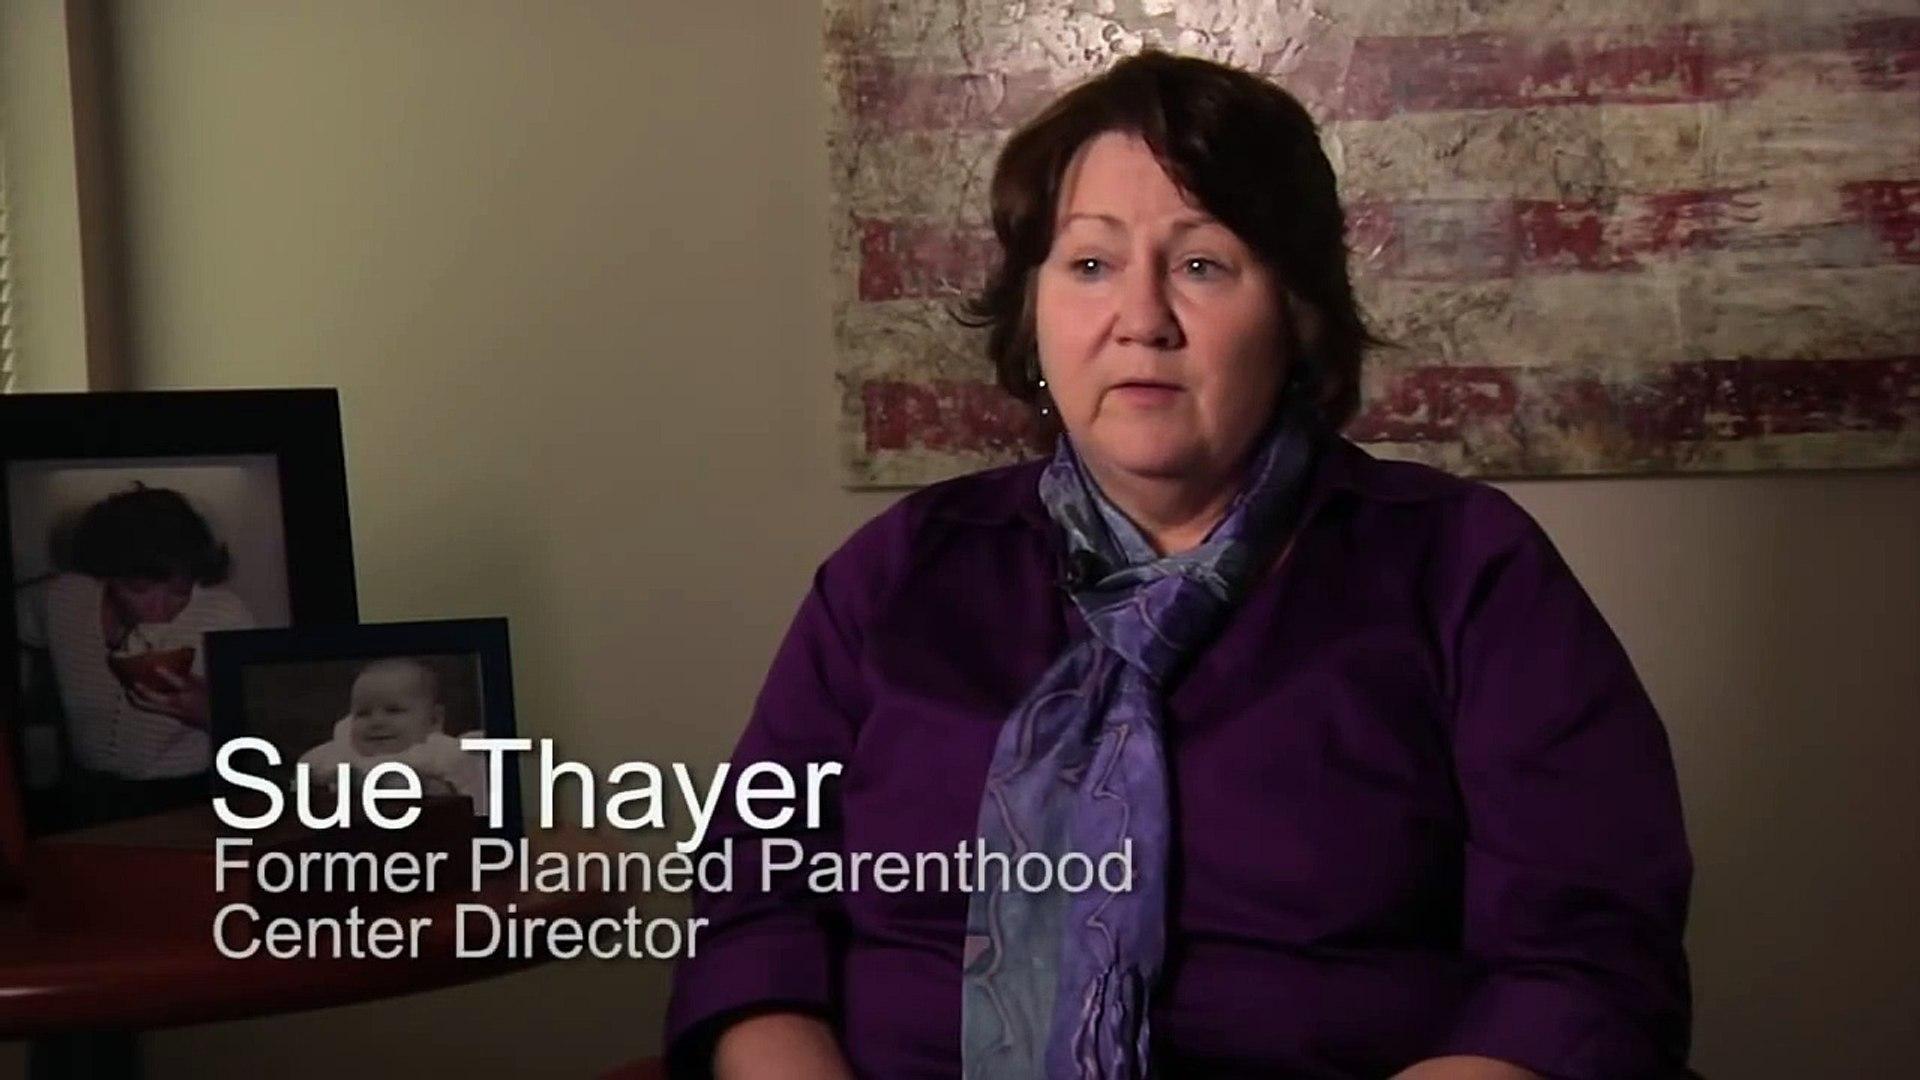 As a non-profit, how does Planned Parenthood generate revenue?